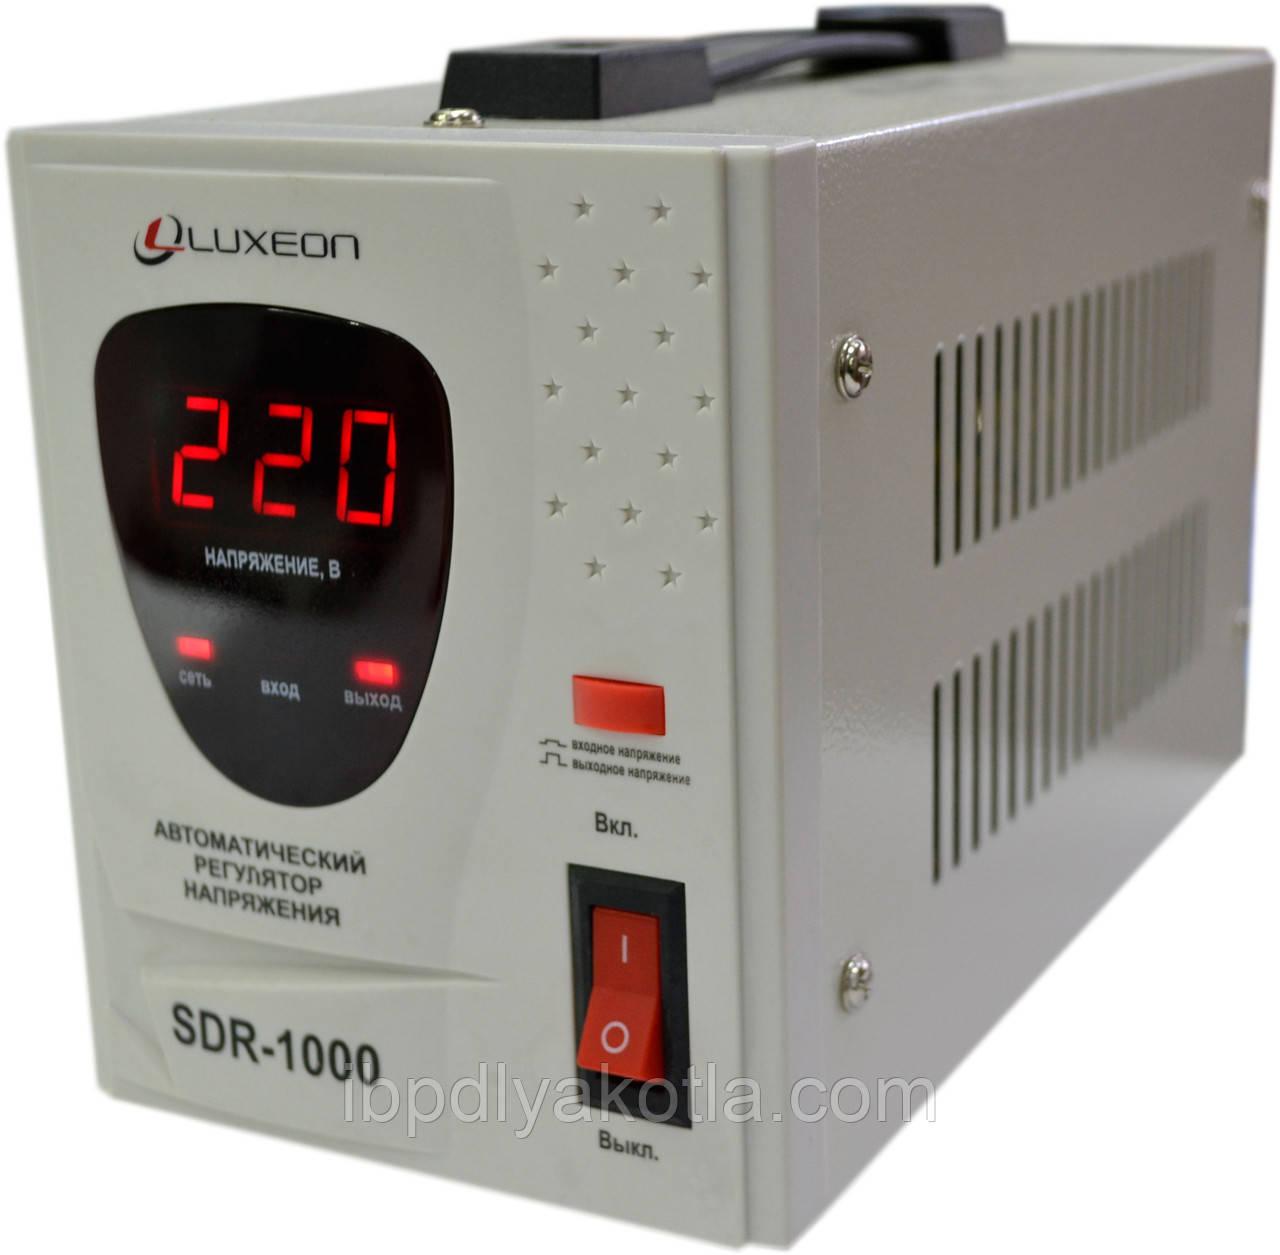 Luxeon SDR-1000VA (600Вт)